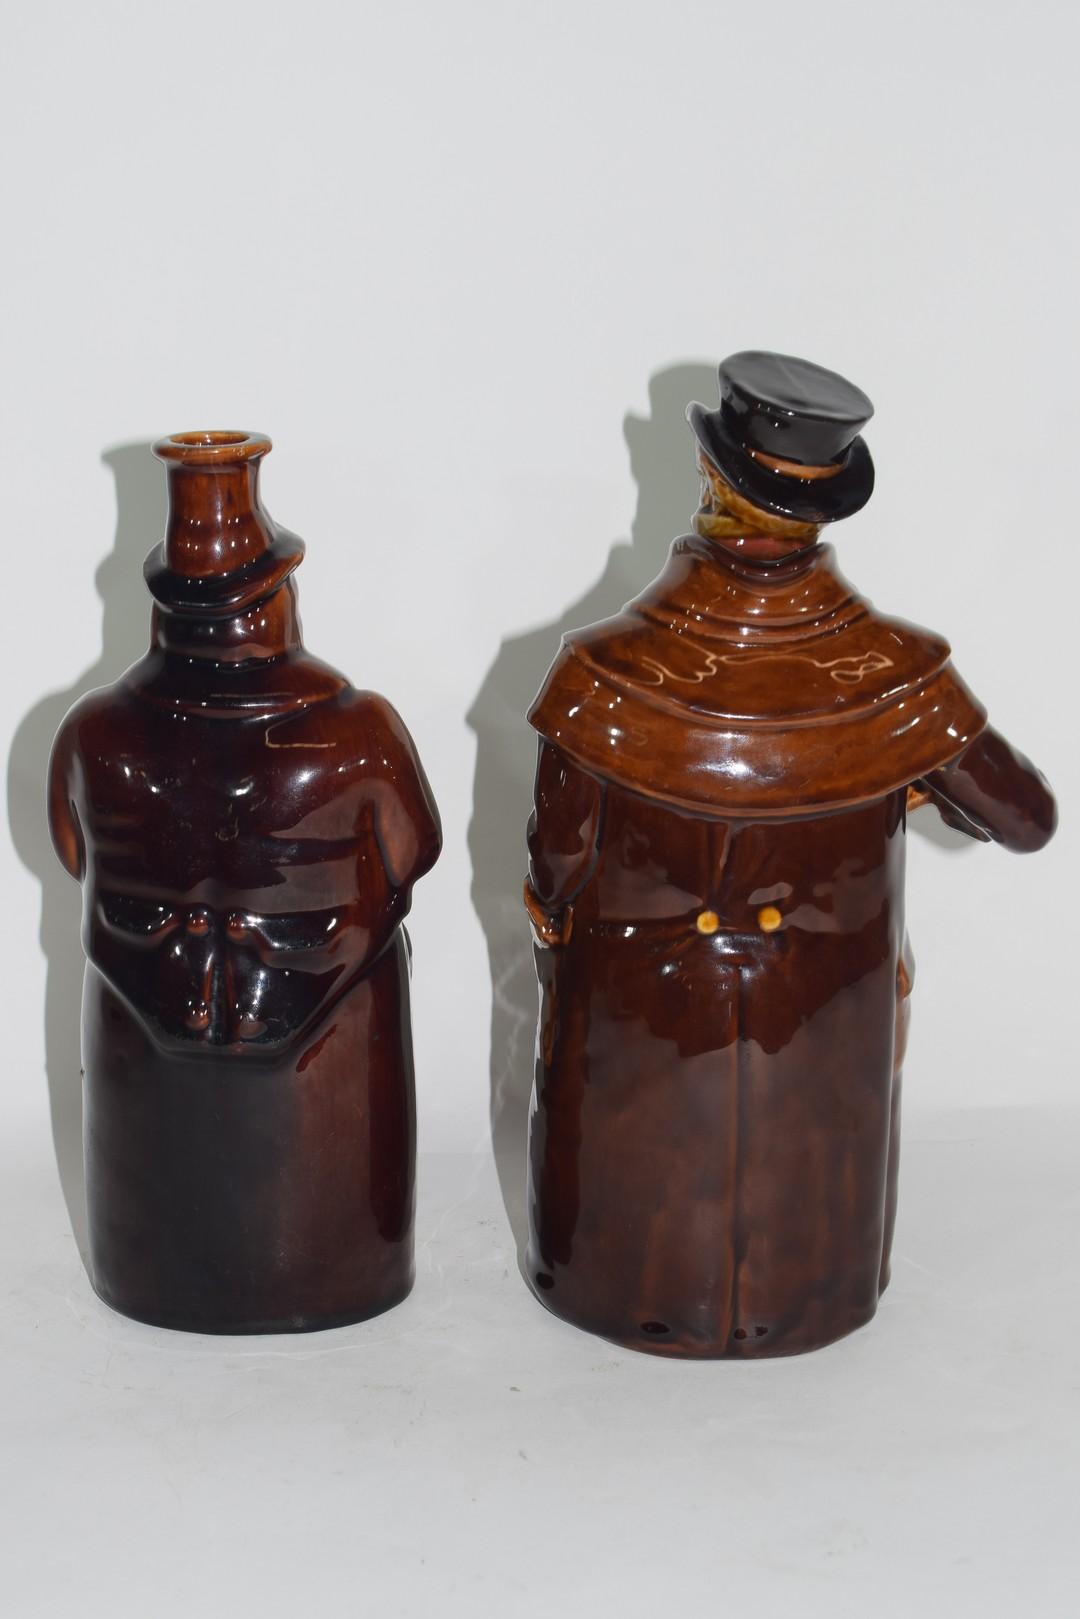 Royal Doulton Kingsware flask - Image 3 of 5